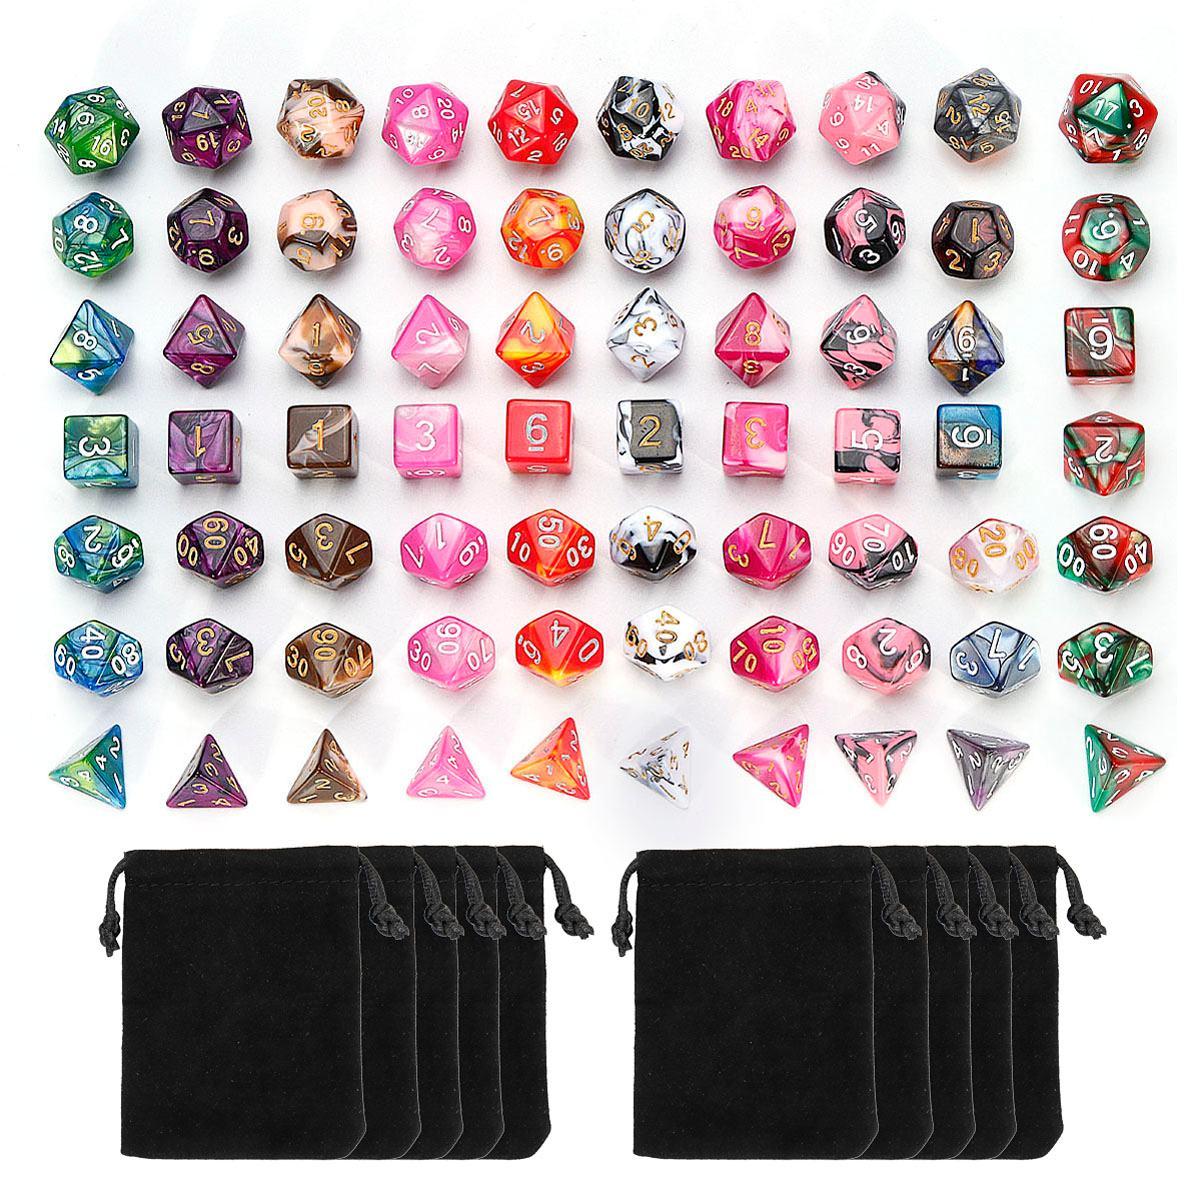 7Pcs סט קוביות Polyhedral קוביות צבע מעורב עבור תפקיד RPG משחק משחק לוח משחק קוביות סט + אחסון תיק